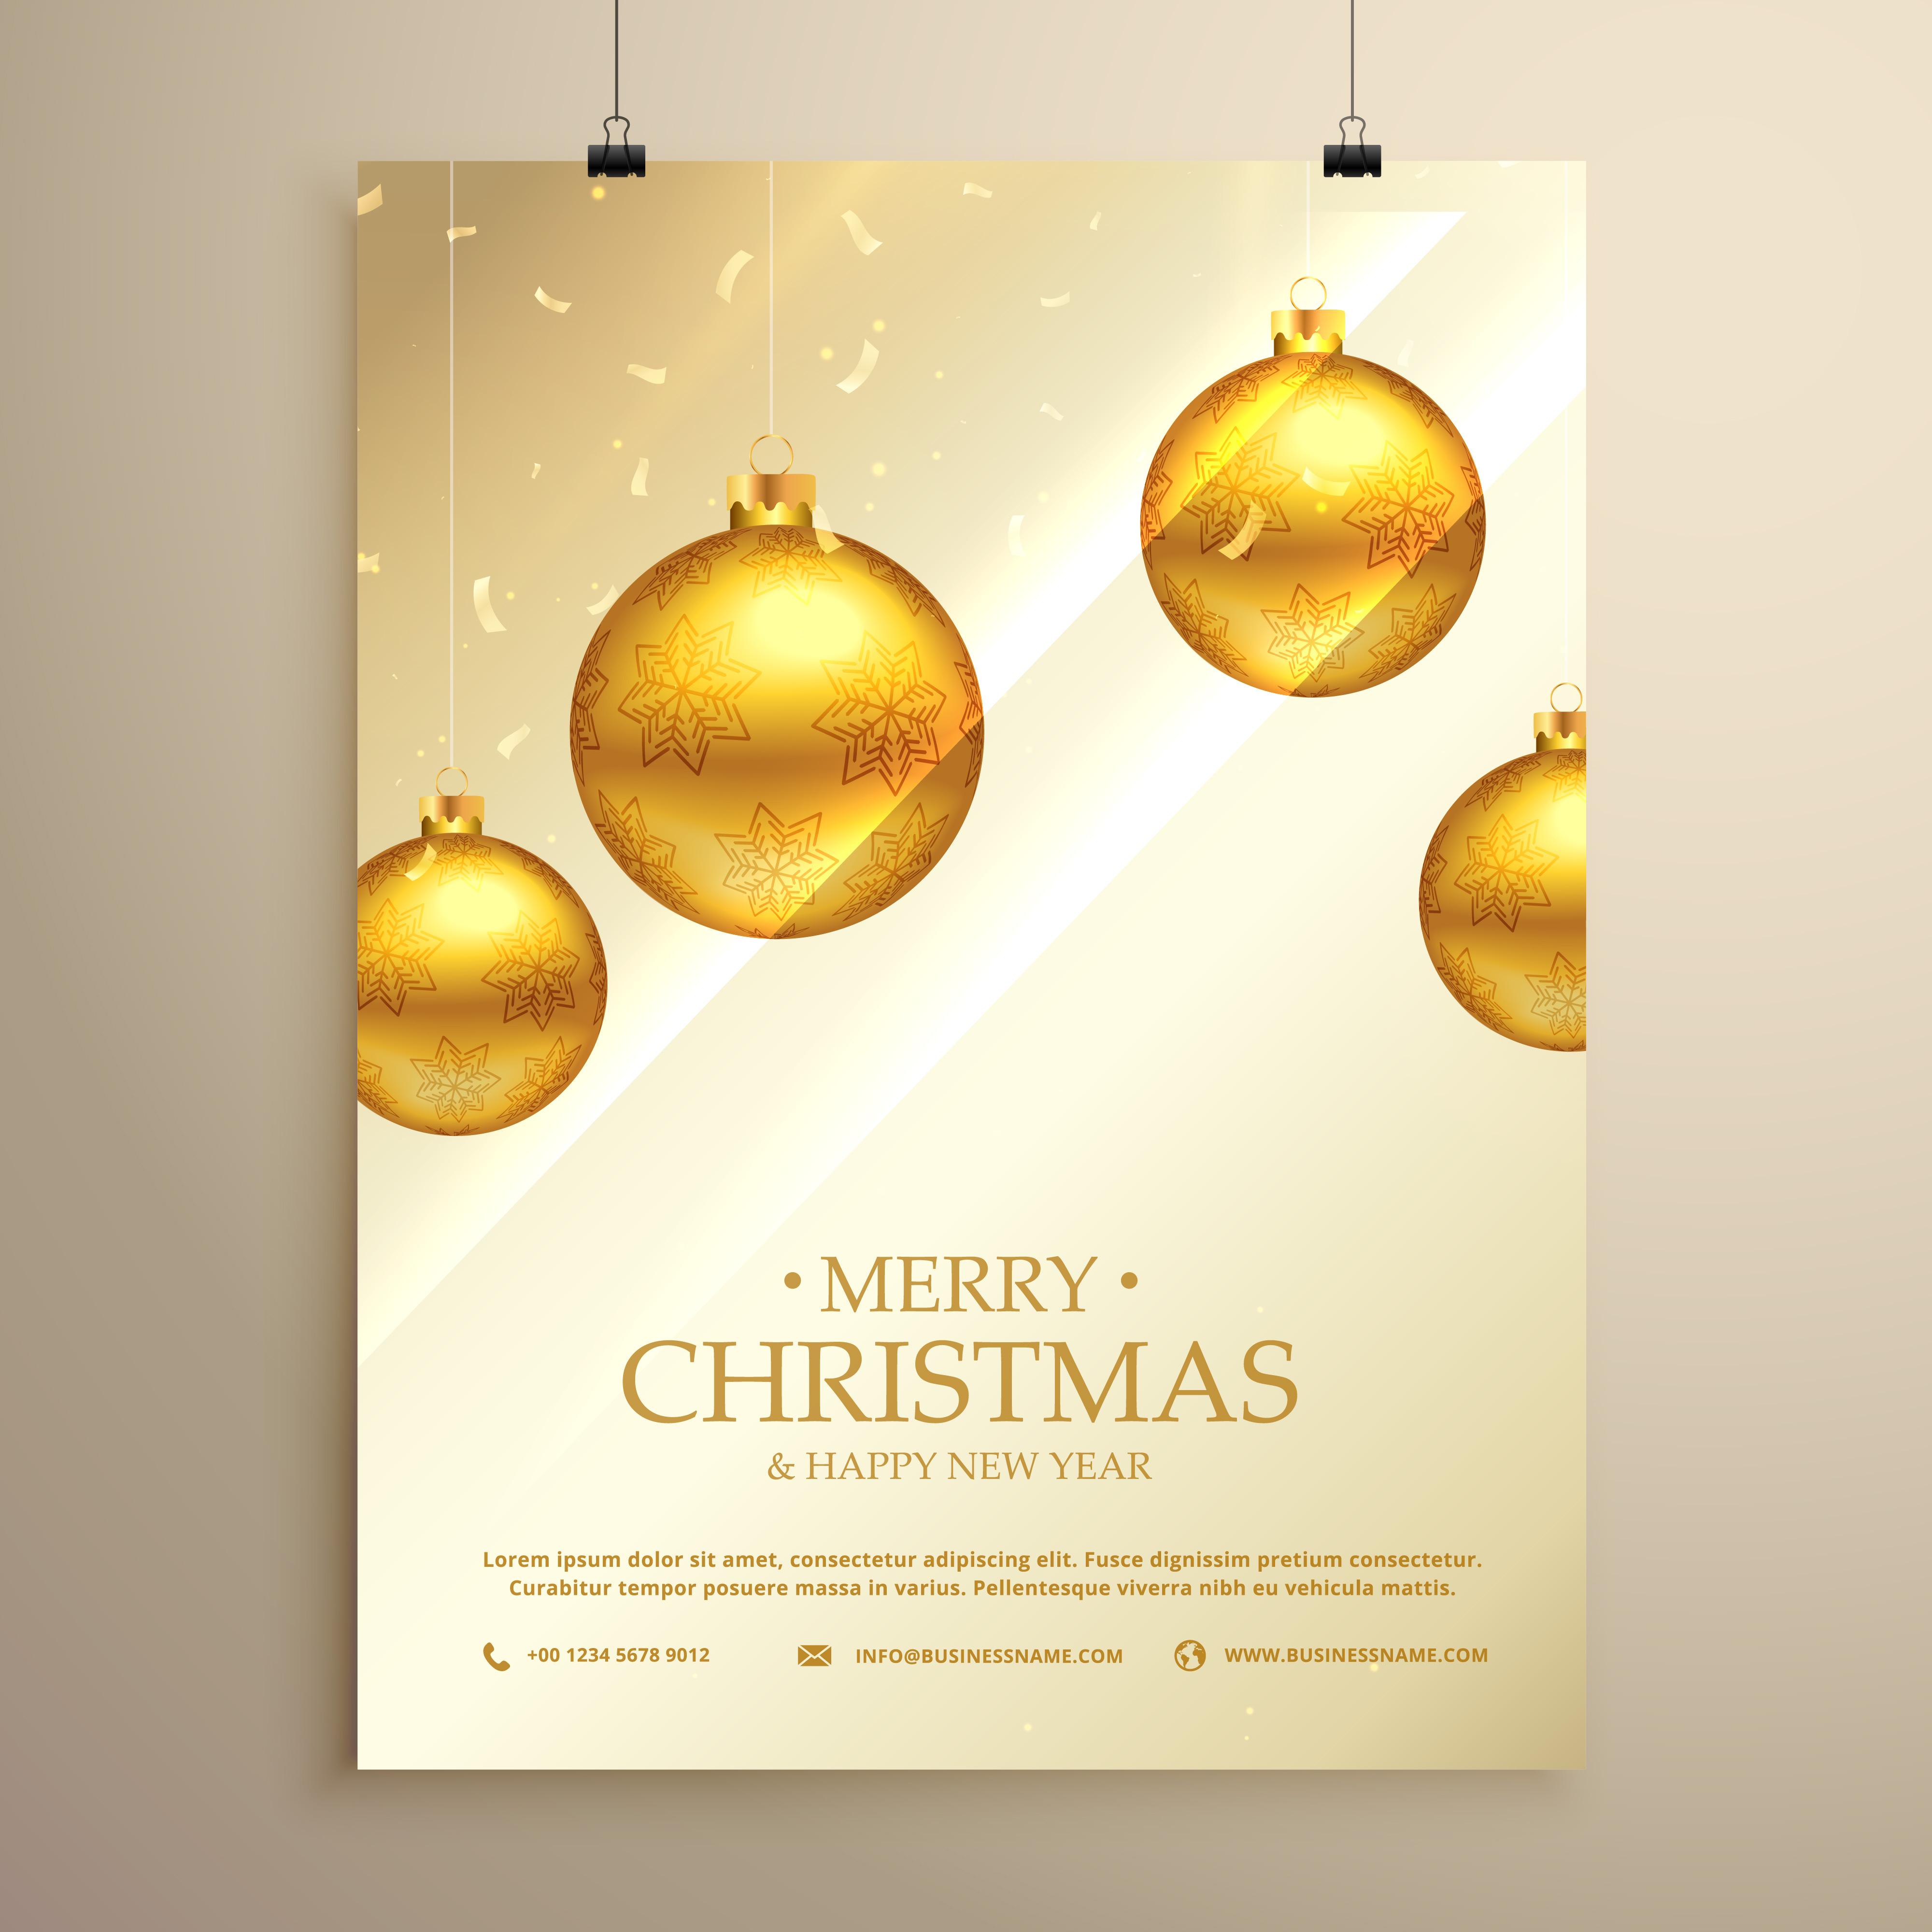 Christmas Brochure Free Vector Art - (8435 Free Downloads)